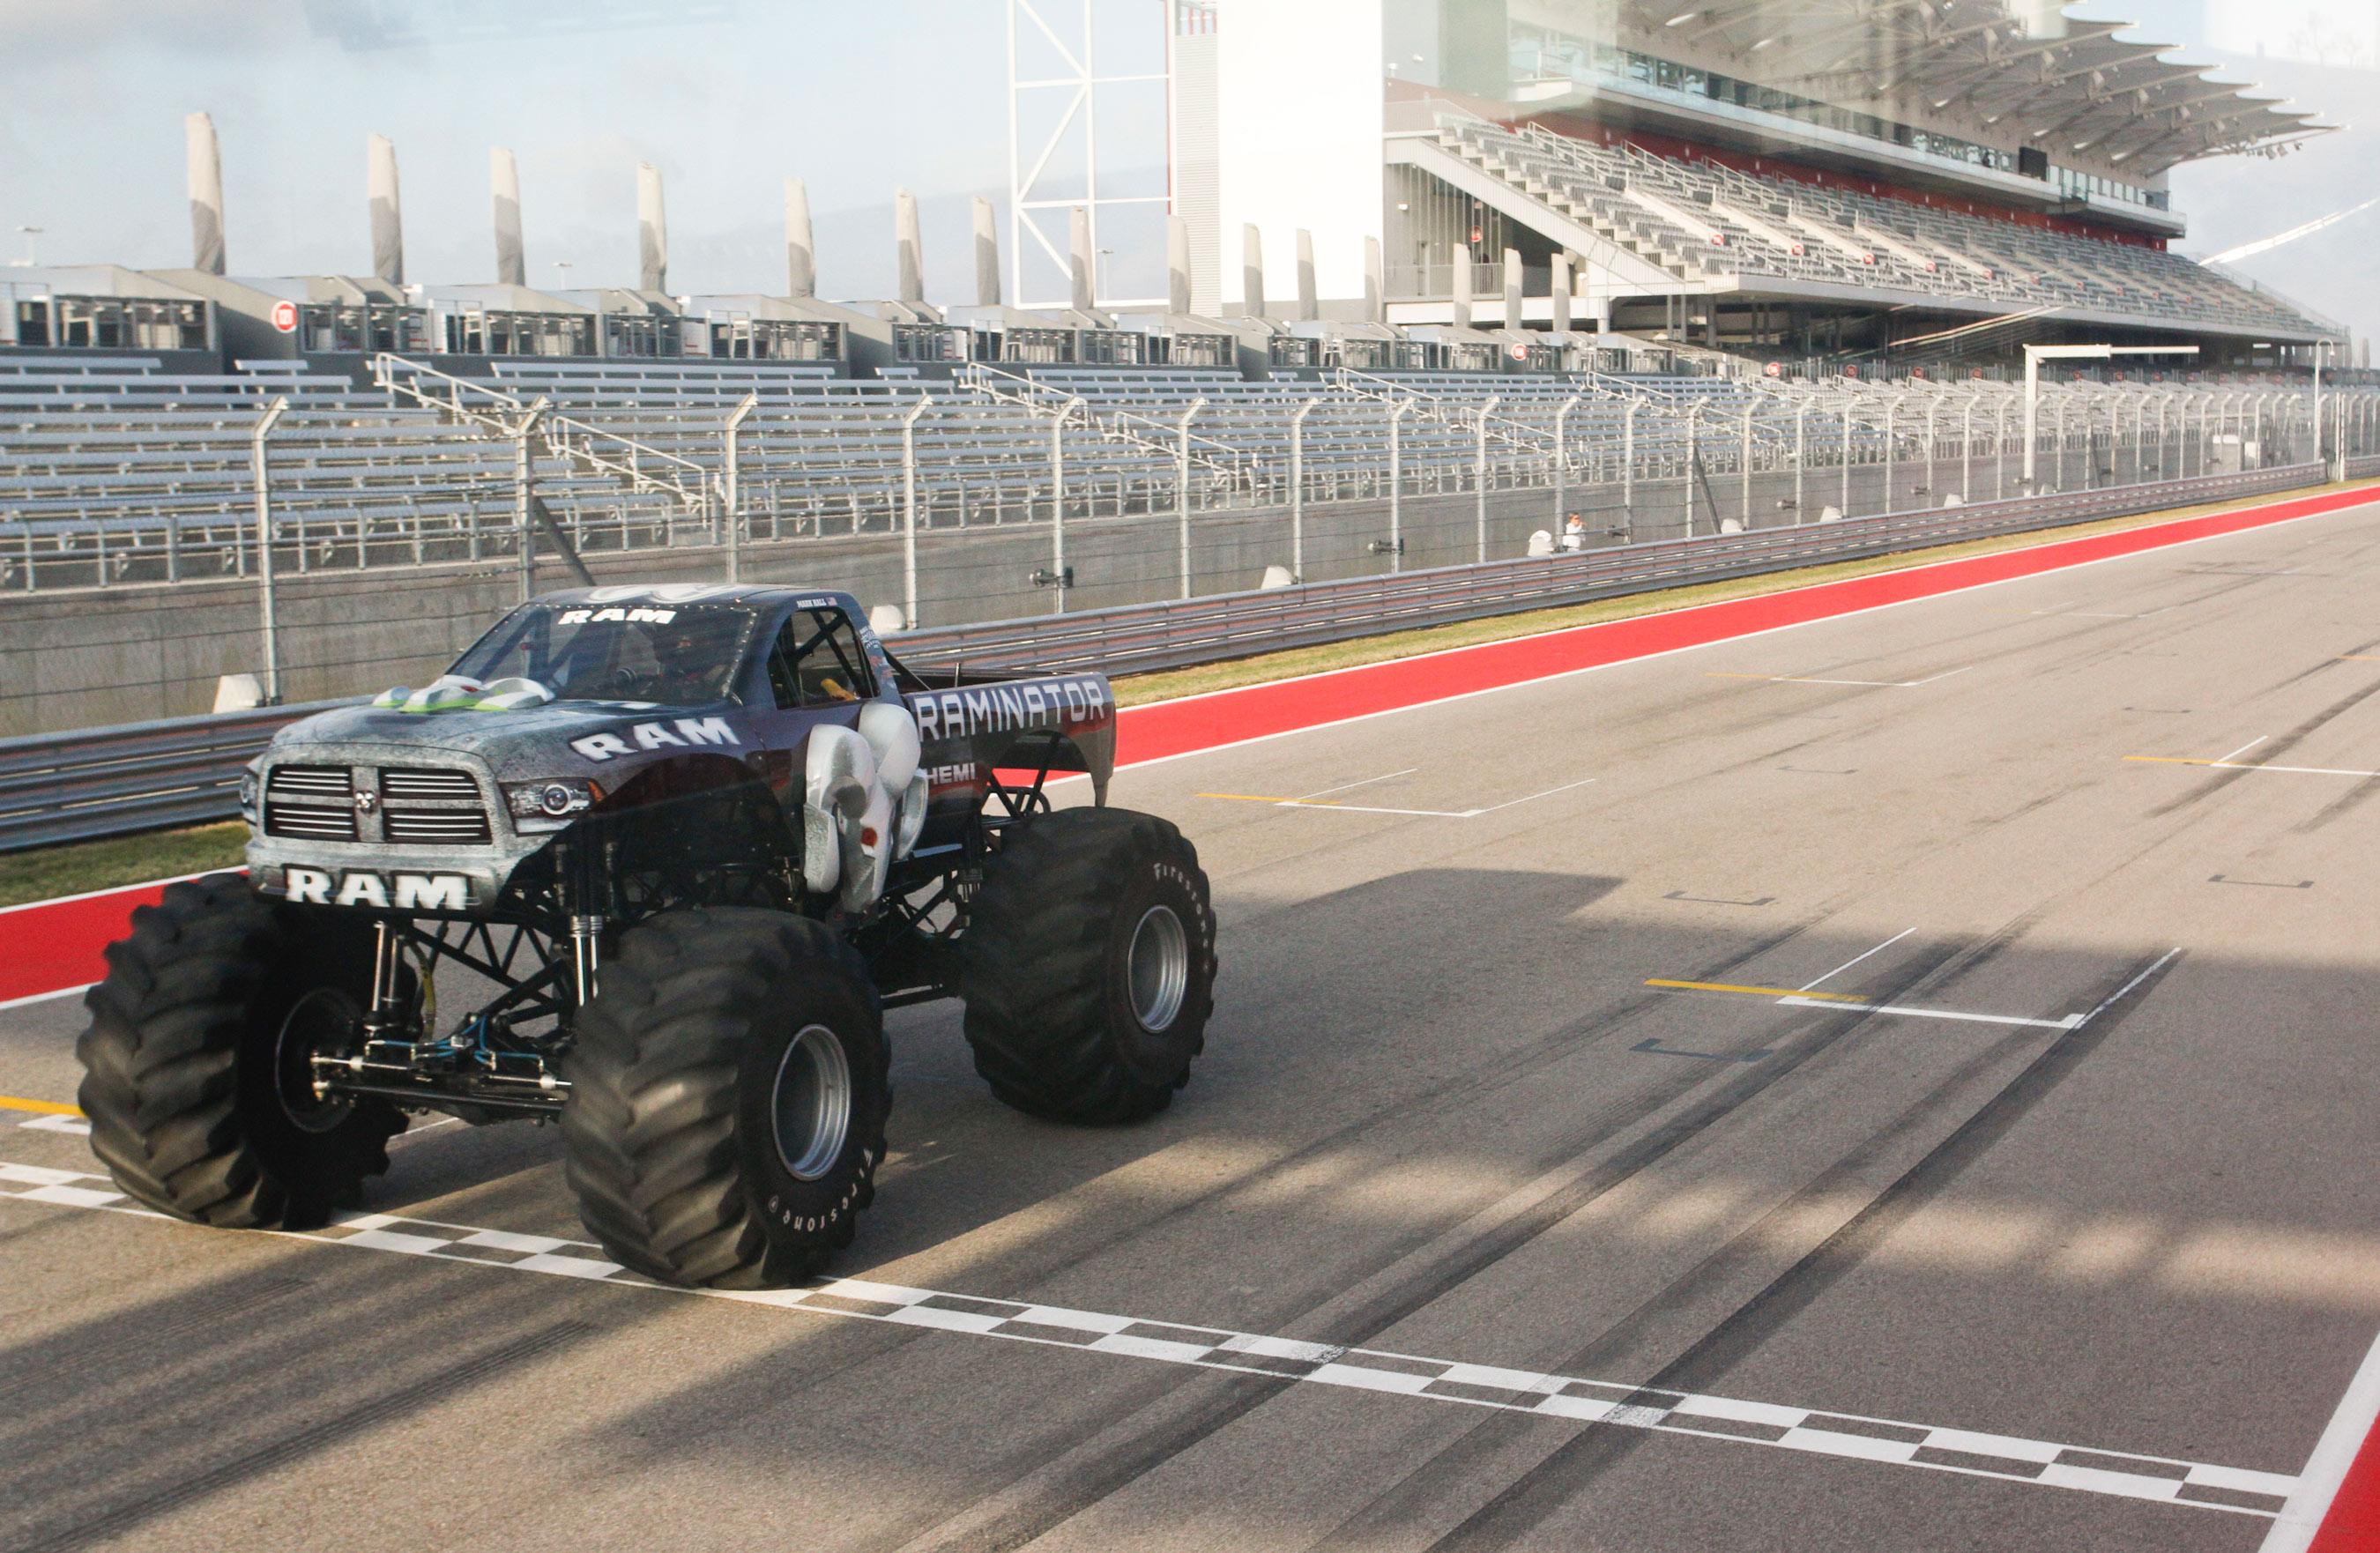 Guinness world records title holder for fastest speed for a monster truck raminator